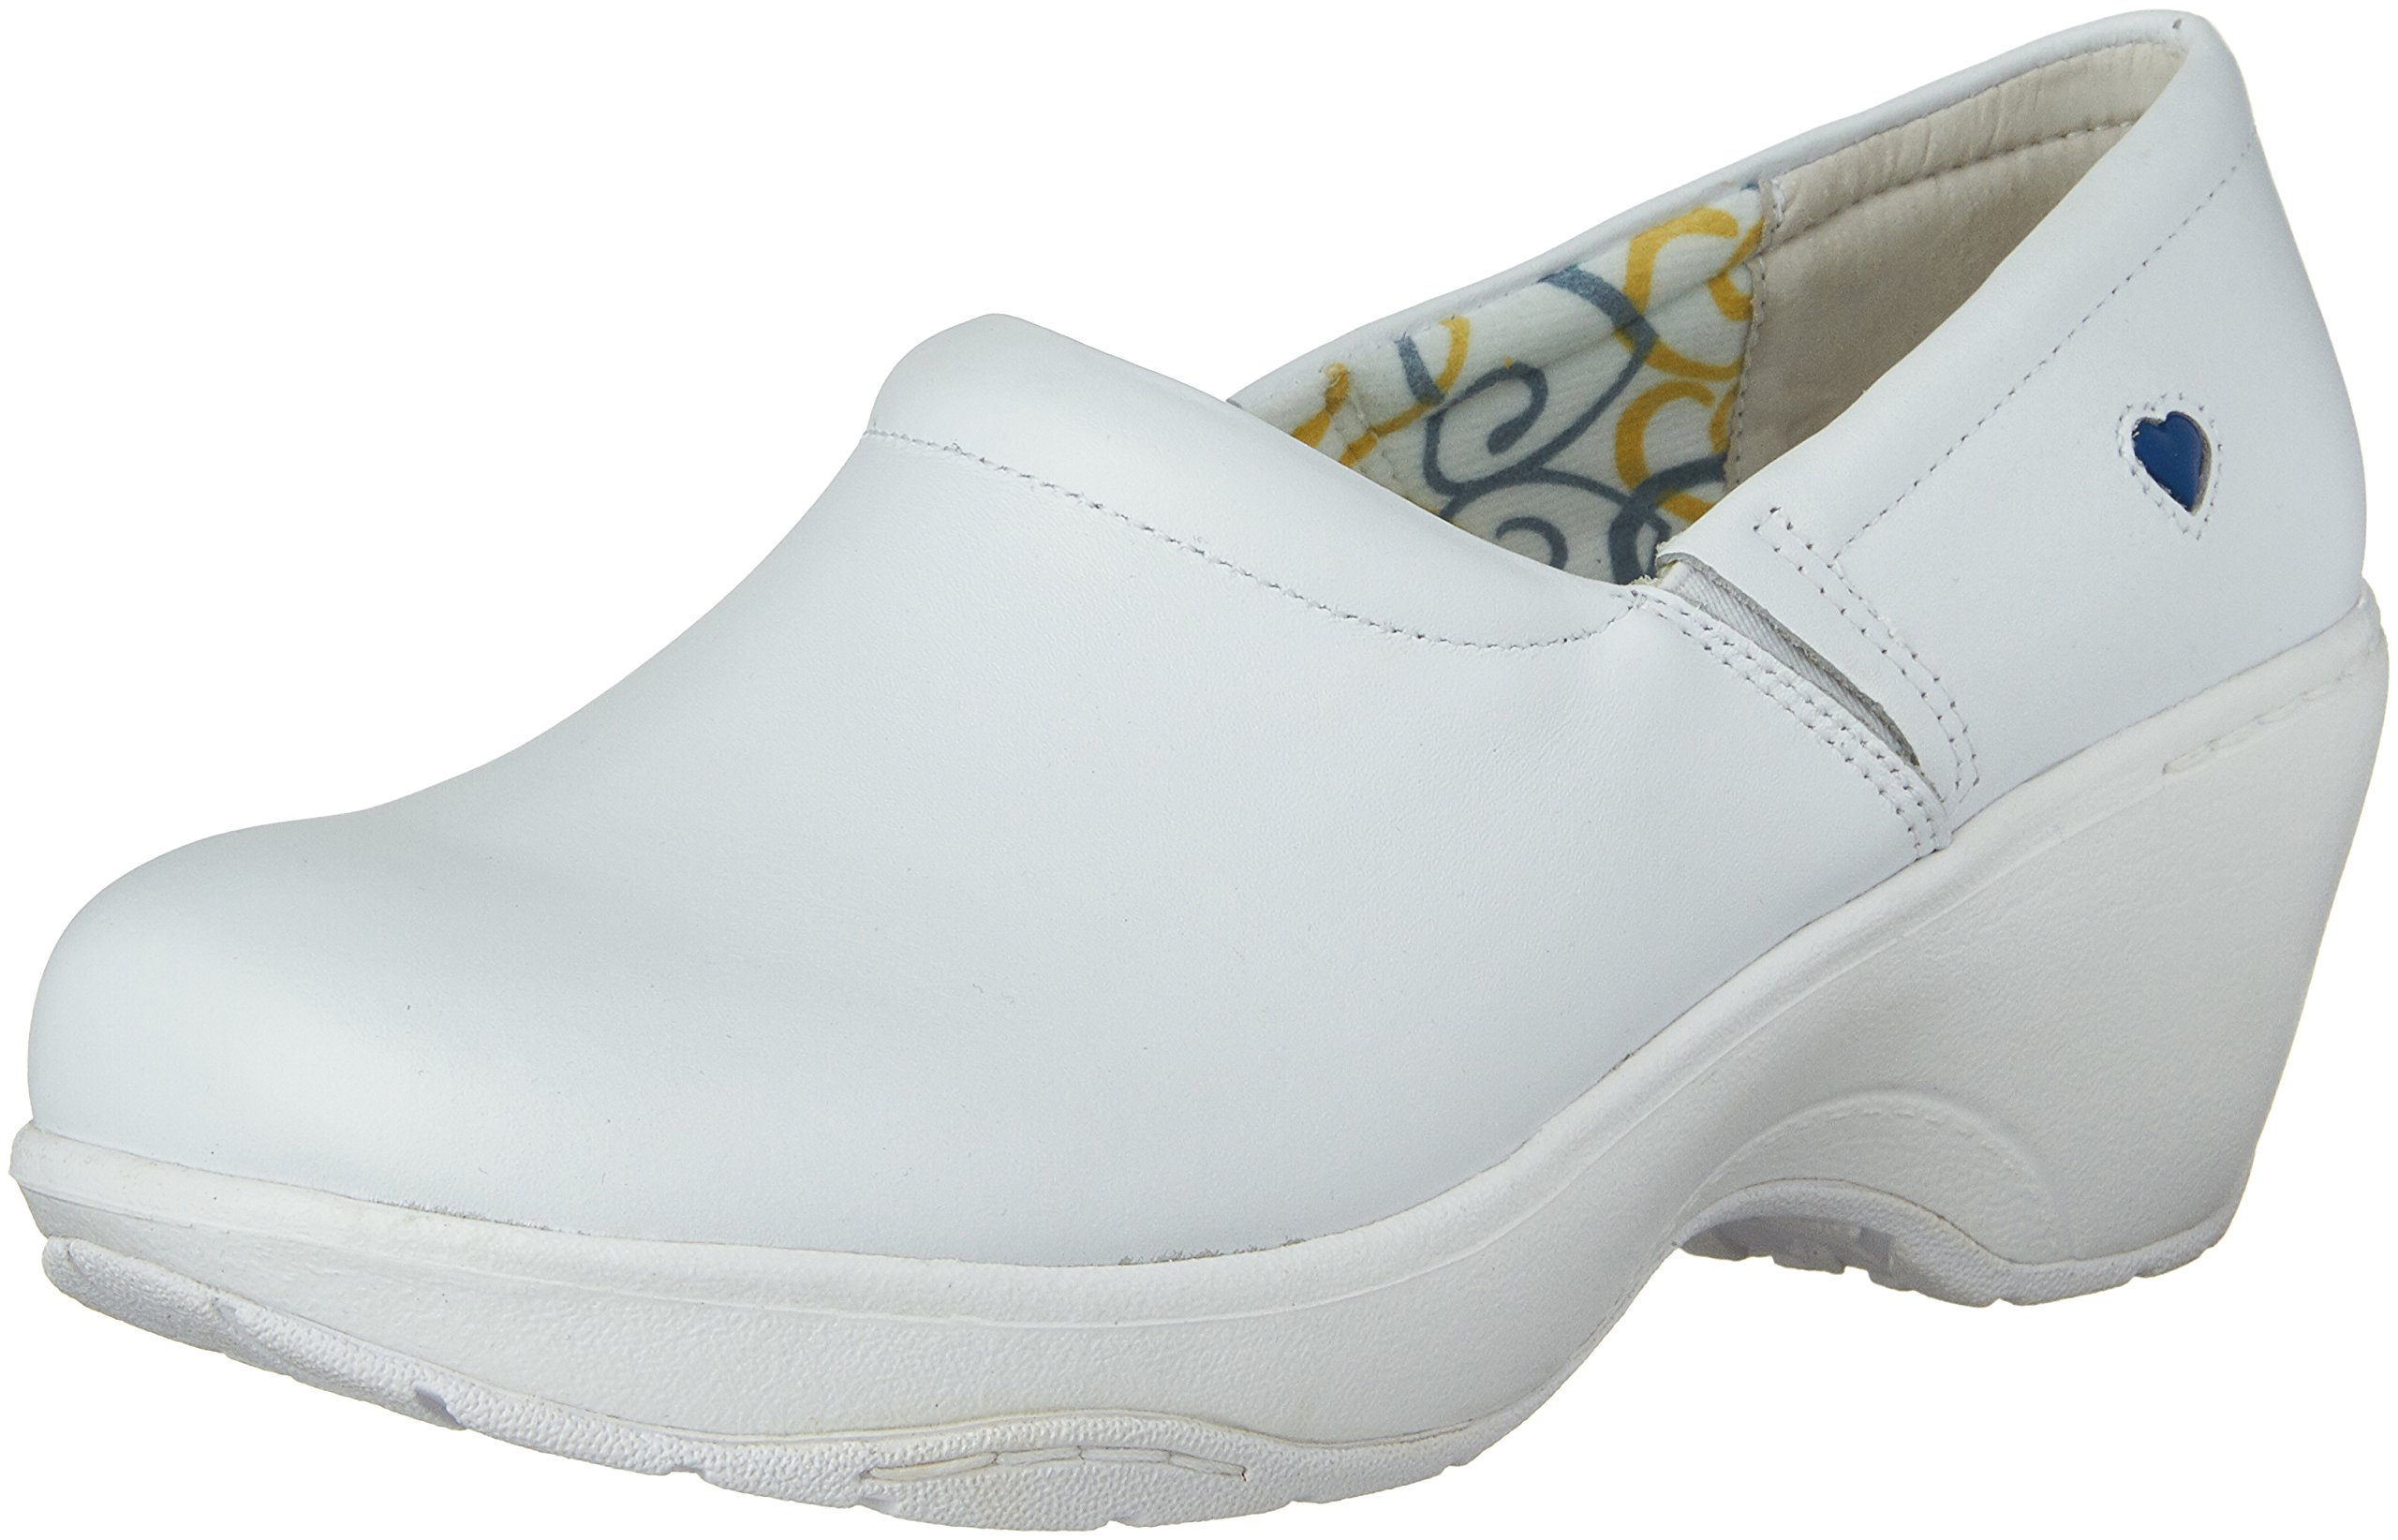 Nurse Mates Women's Bryar Slip-On Clog Shoes, White Leather, 9.5 M/B